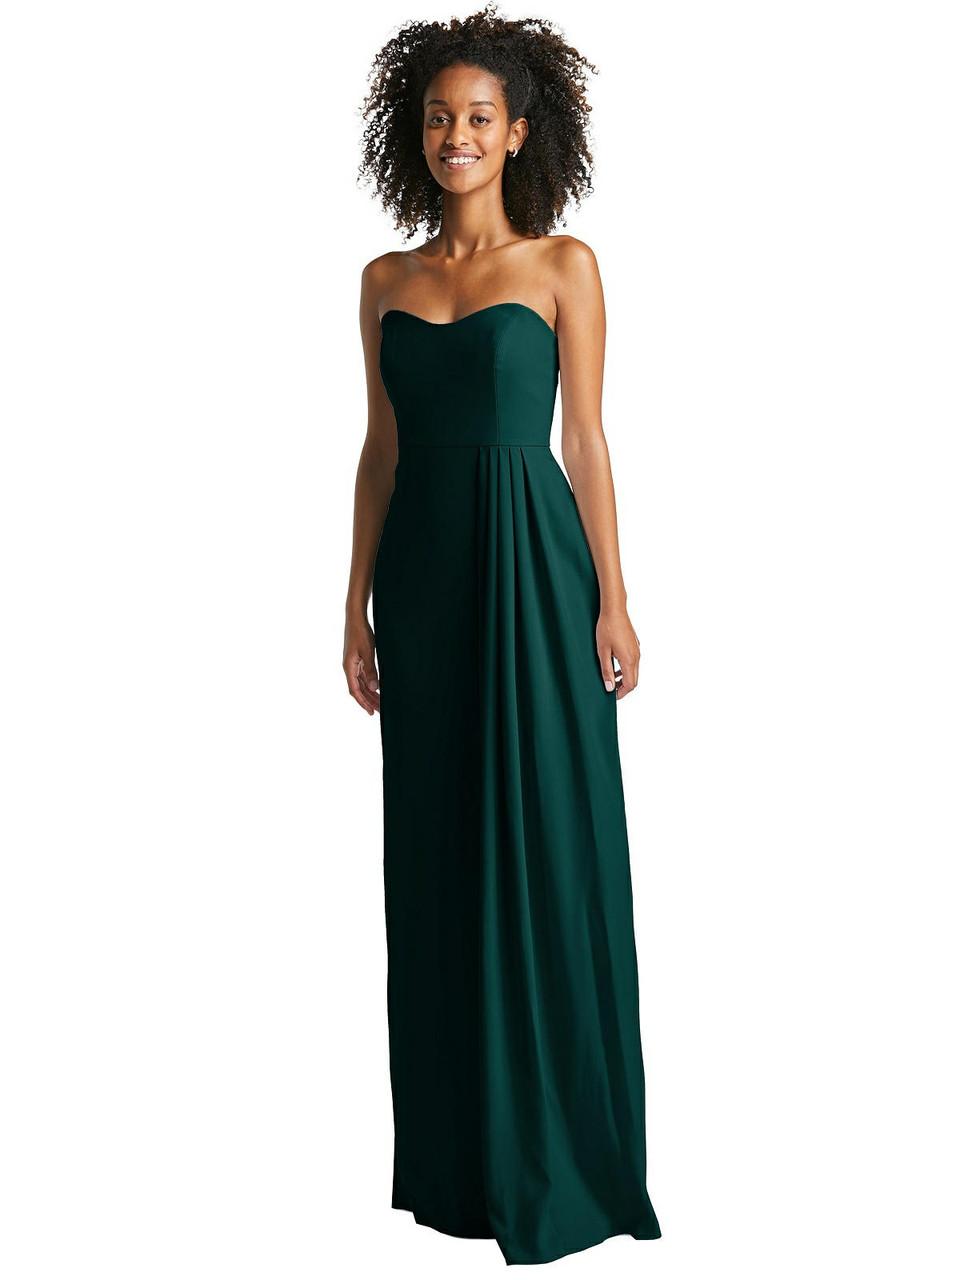 Jenny Packham Style JP1058  |  Crepe- Strapless Maxi Dress with Pleated Drape Skirt